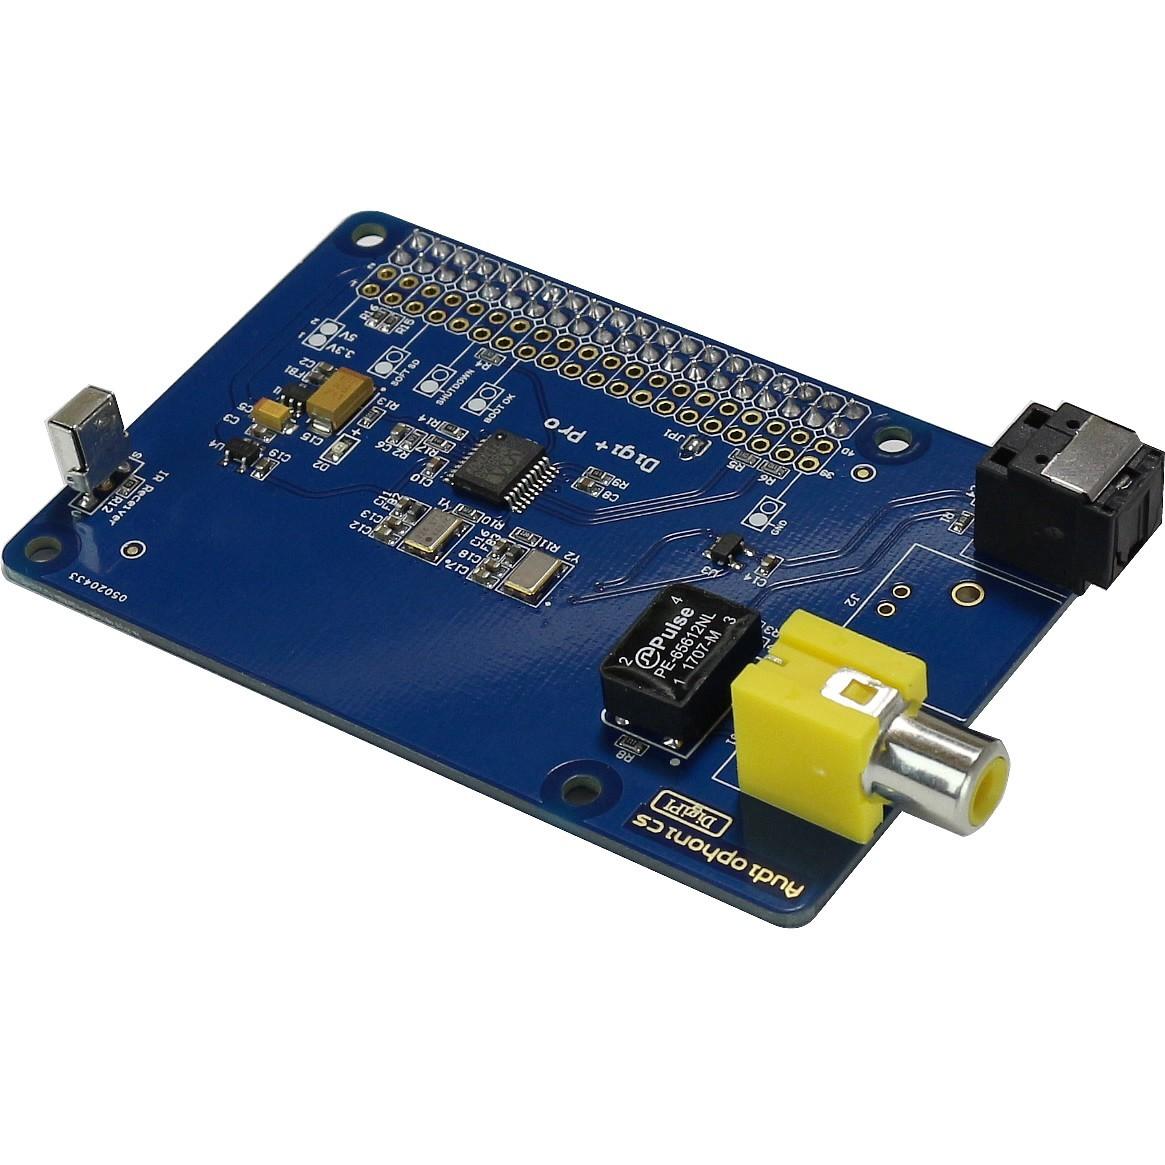 AUDIOPHONICS Digipi+ PRO Digital interface WM8804 for Raspberry Pi